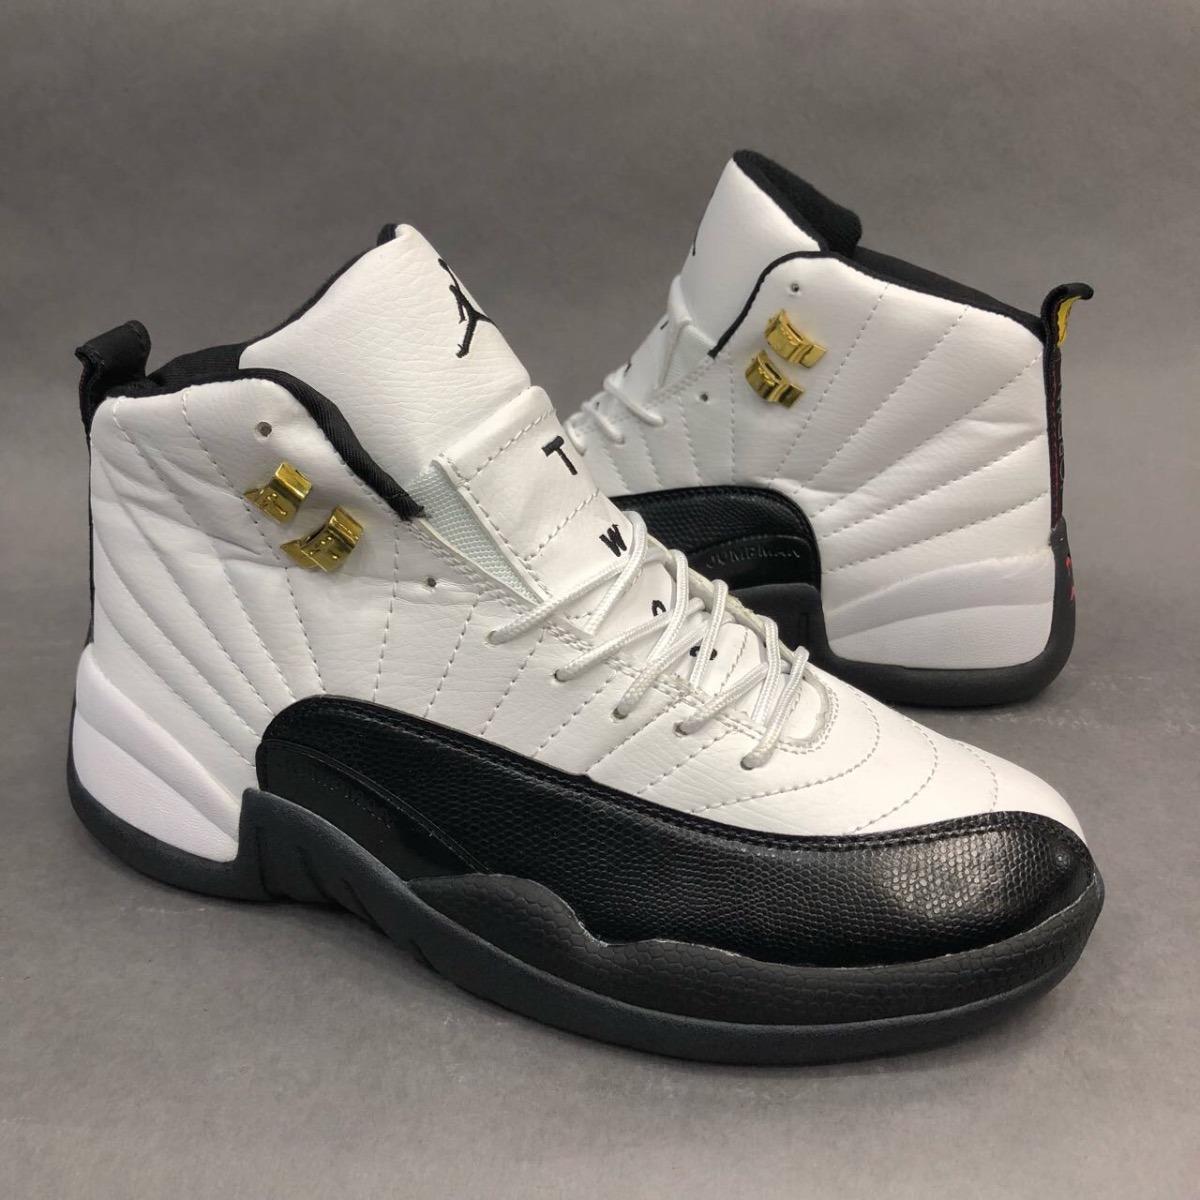 144e499741f89 botas zapatillas nike jordan jumpman blanco negro hombre env. Cargando zoom.